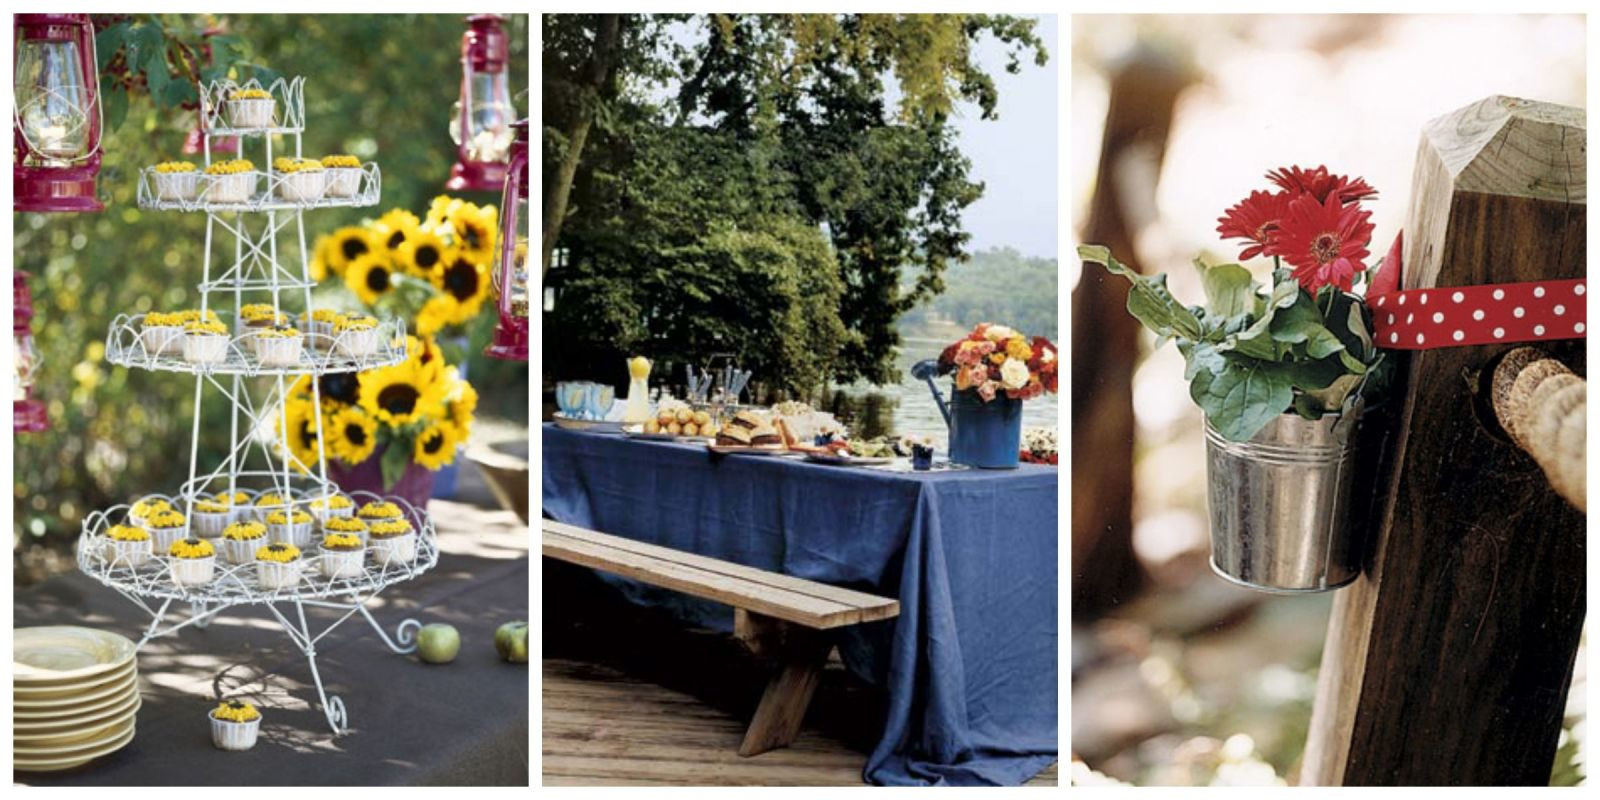 Backyard Summer Party Decorating Ideas  Outdoor Party Decoration Ideas Summer Party Decorating